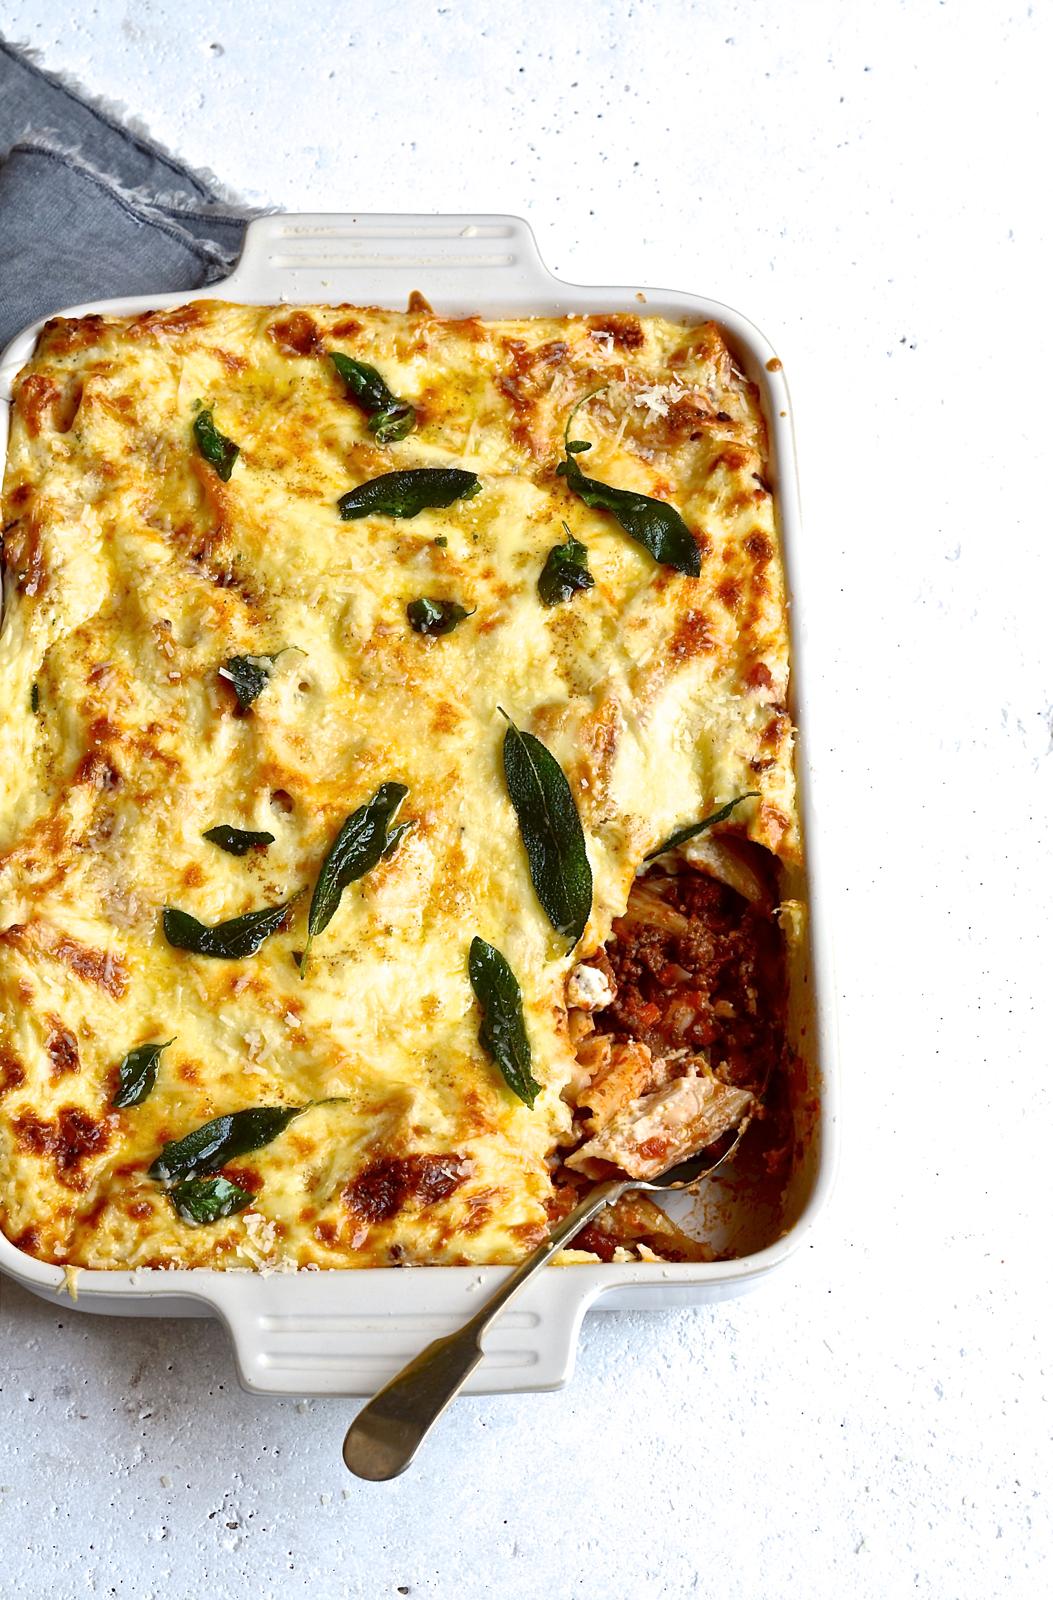 Fifteen World Pasta Day Recipes | Bibbyskitchen recipes